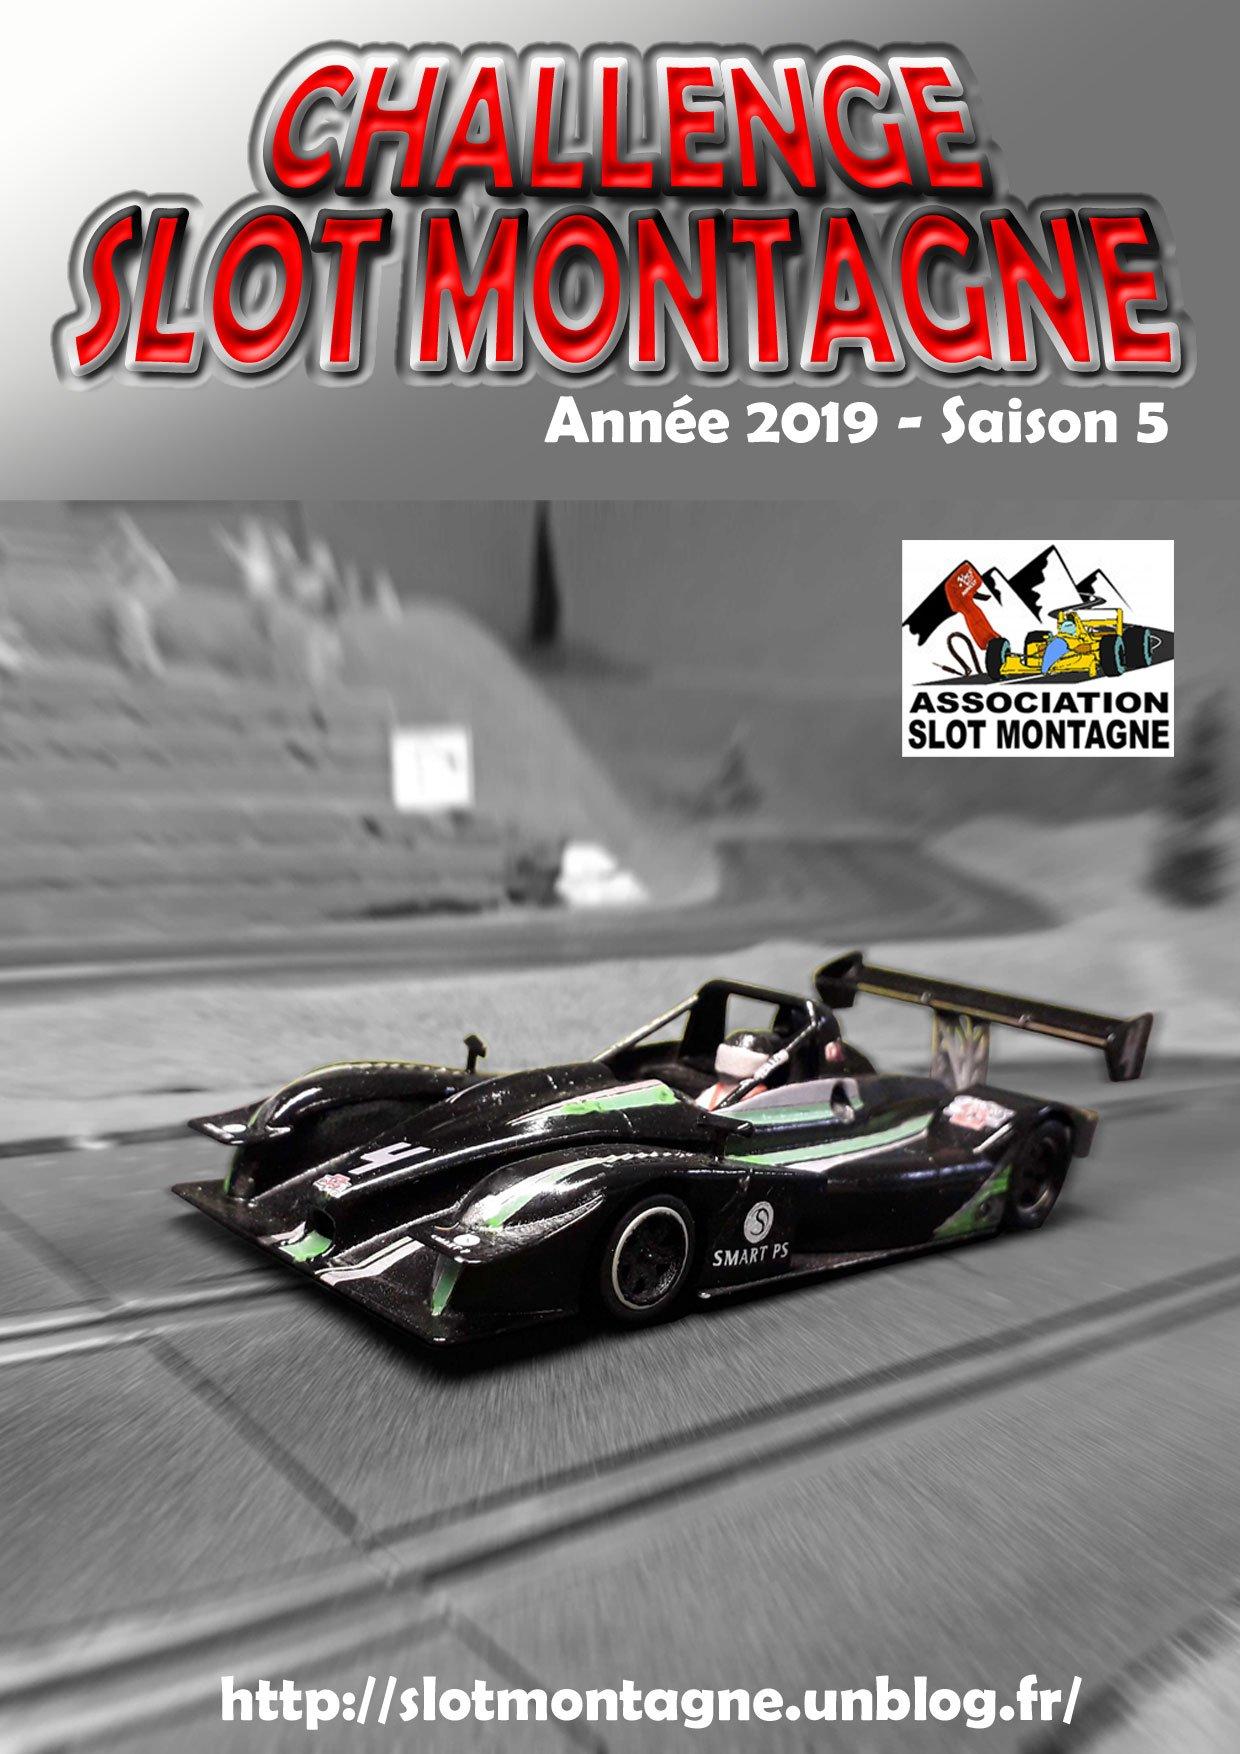 challenge slot montagne 2019